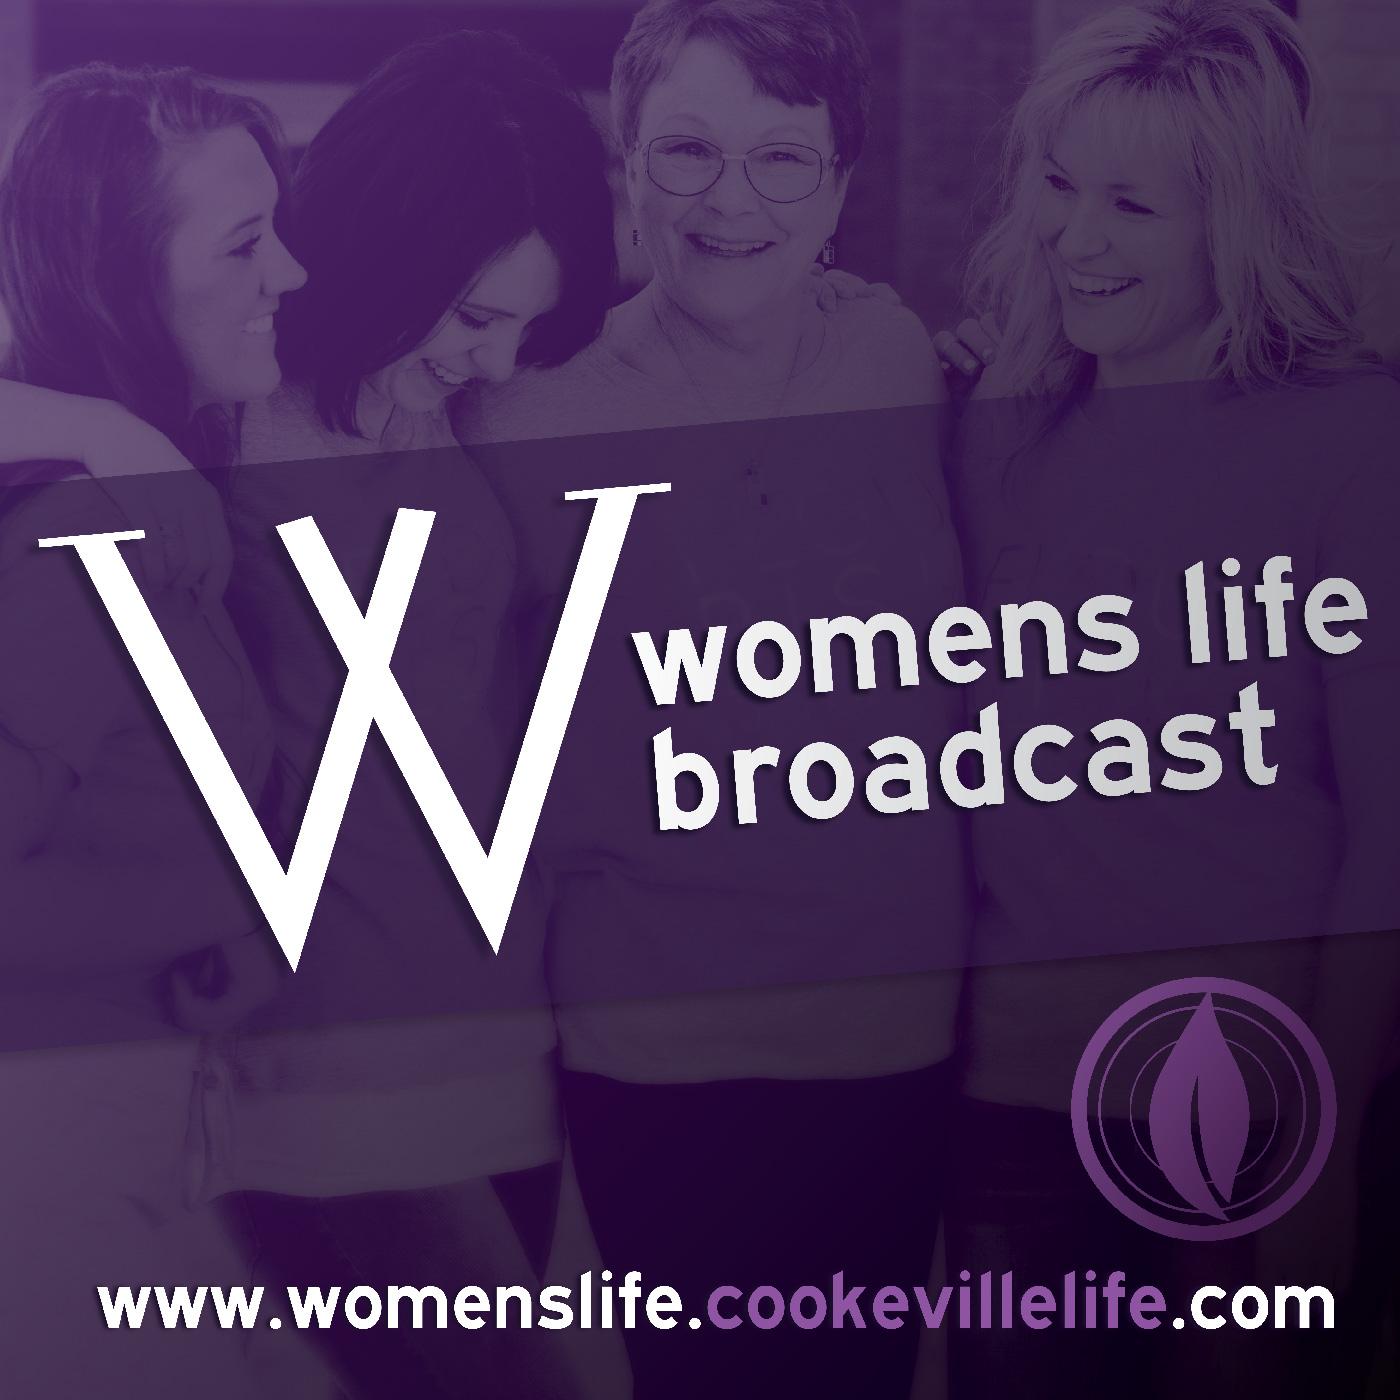 Womens Life Broadcast